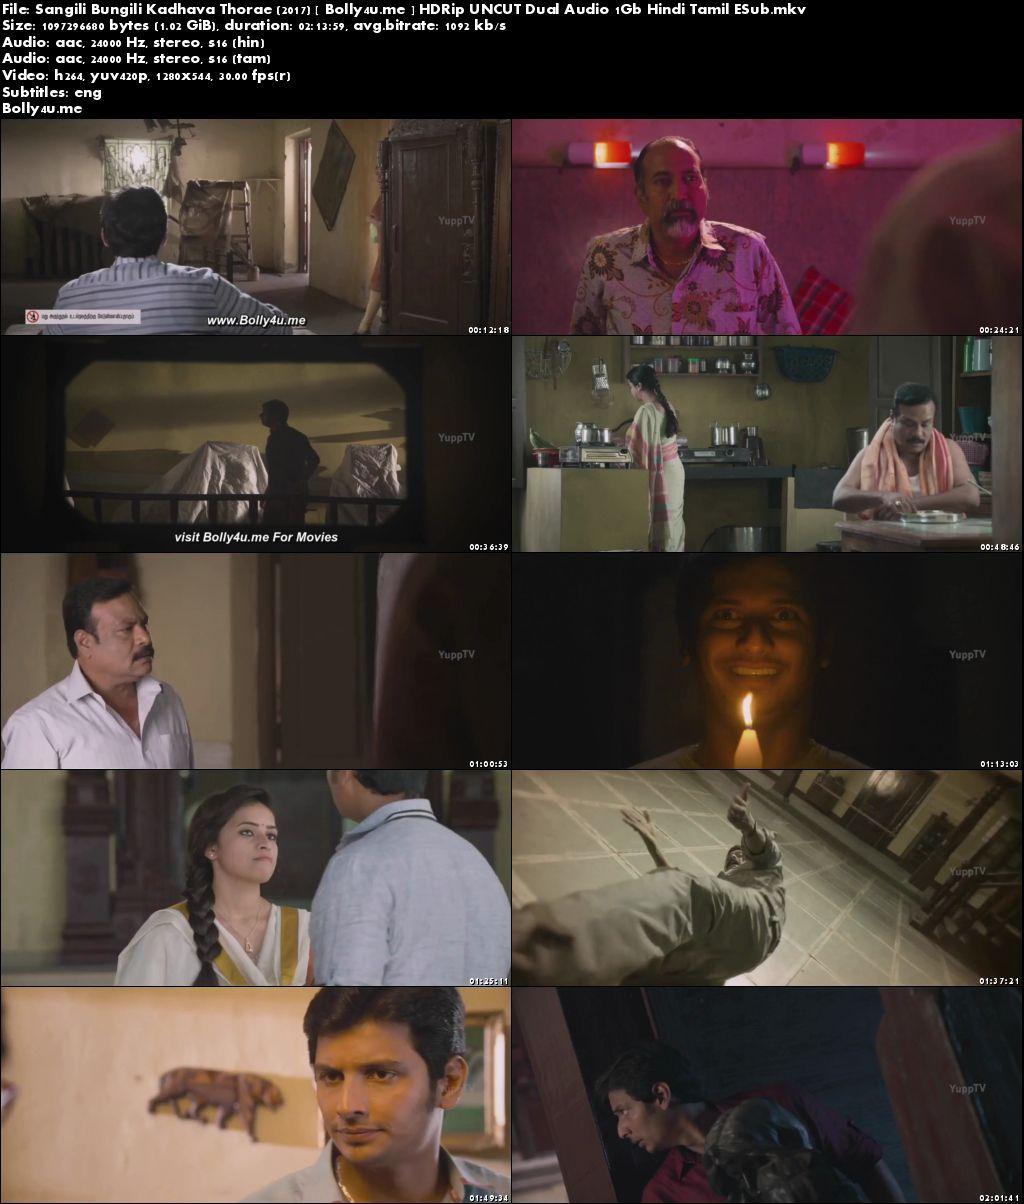 Sangili Bungili Kadhava Thorae 2017 Hindi Dual Audio UNCUT HDRip 400MB 480p 720p 1GB